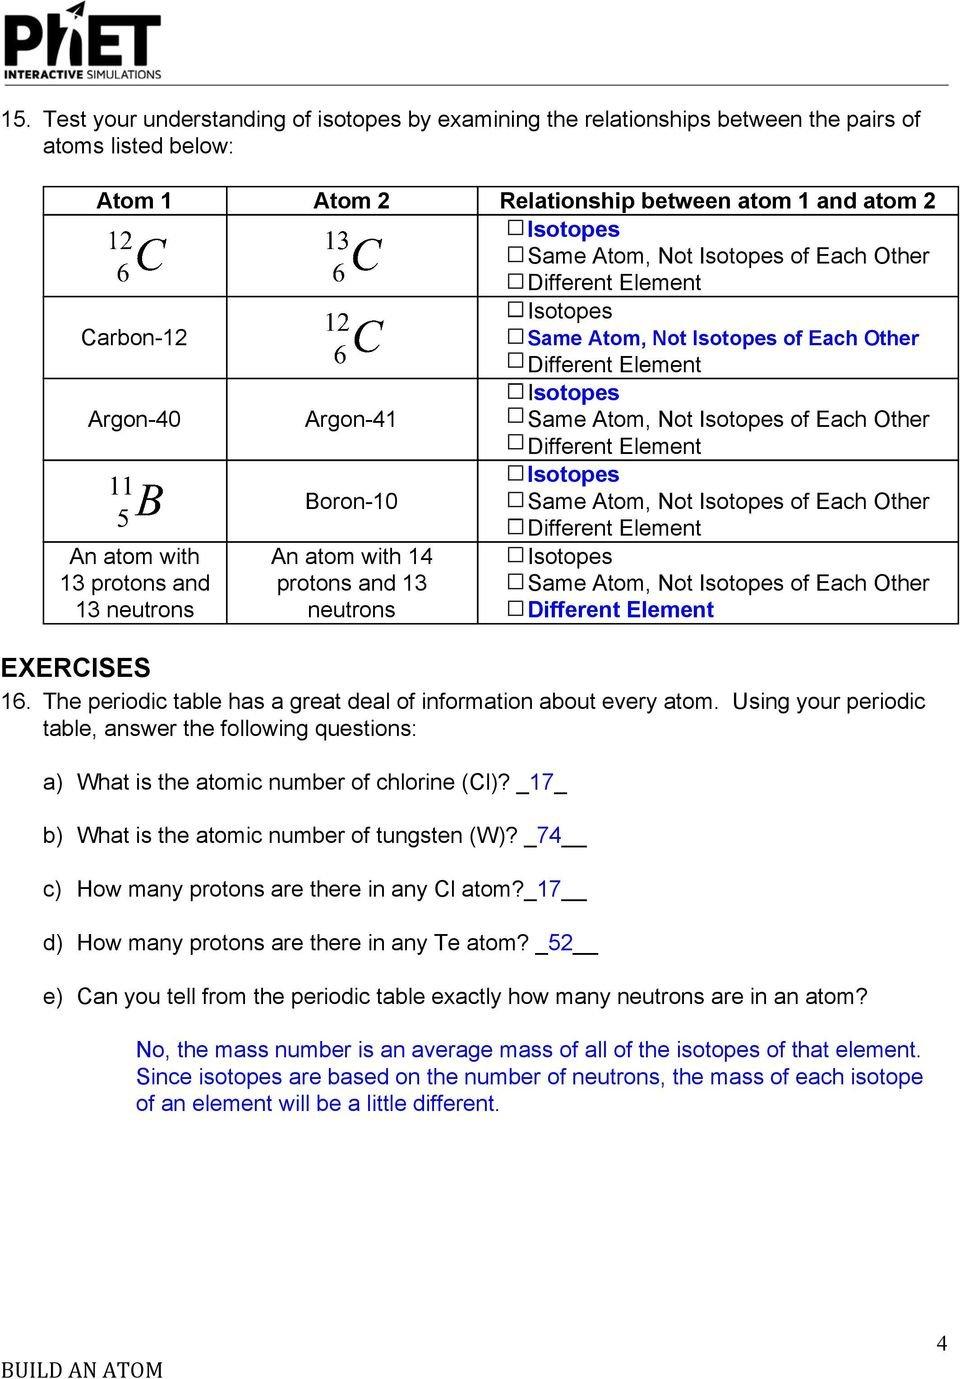 Phet Build An Atom Worksheet — excelguider.com